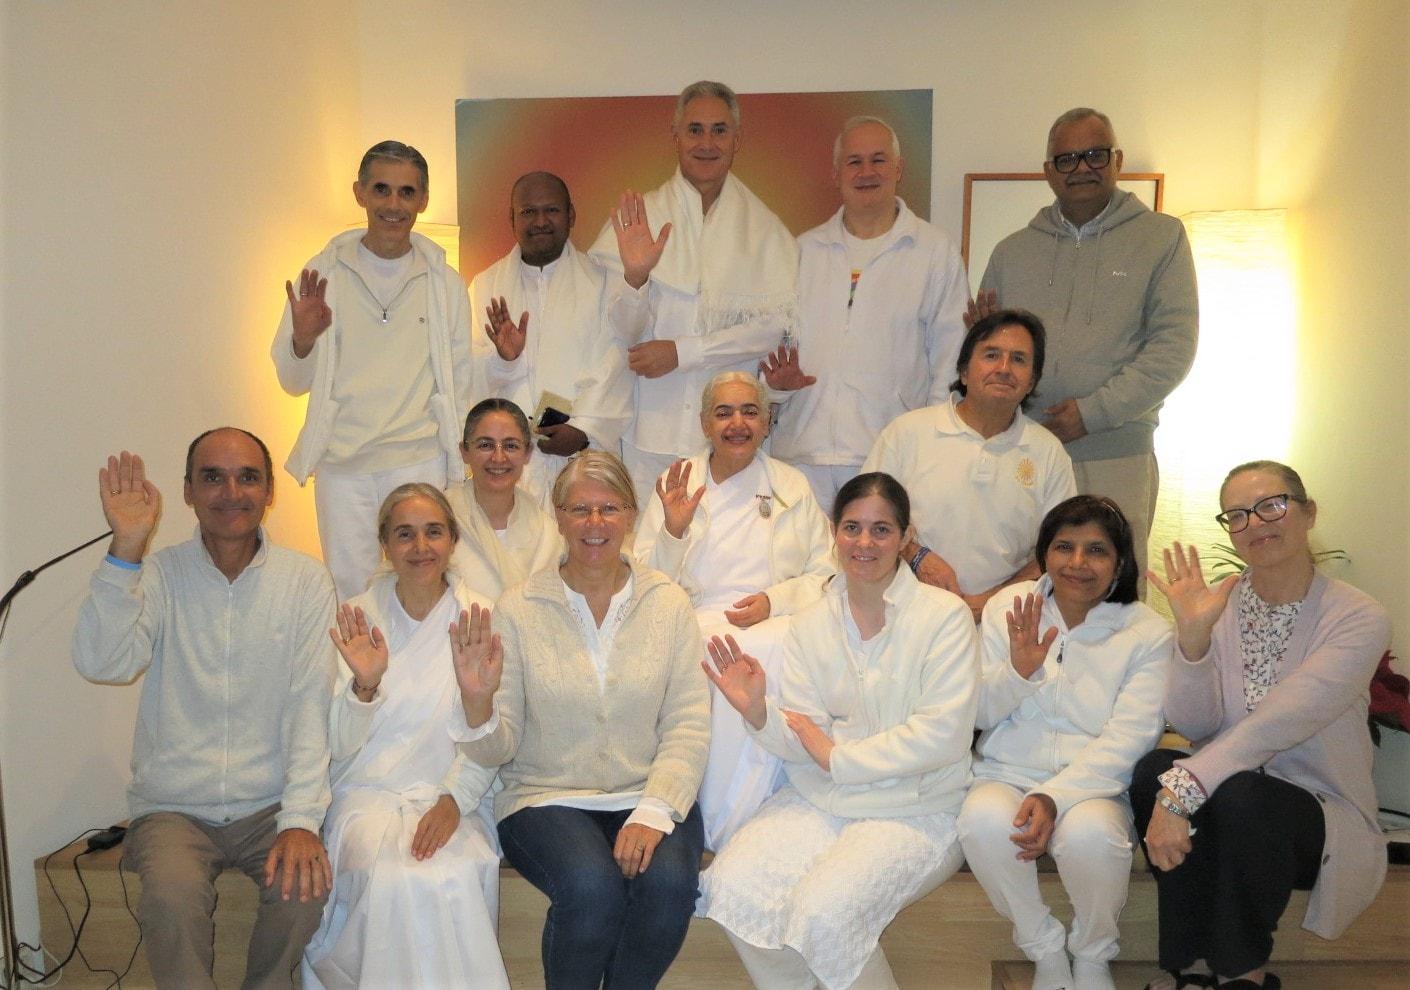 COP25 team.  Back row:Jose Maria, Shantanu, Henriques, Bill, Sanjay.   Middle row: Marta, Sister Jayanti, Antonio.   Front row: Golo, Shanti, Sonja, Carolin, Urmail, Julia.